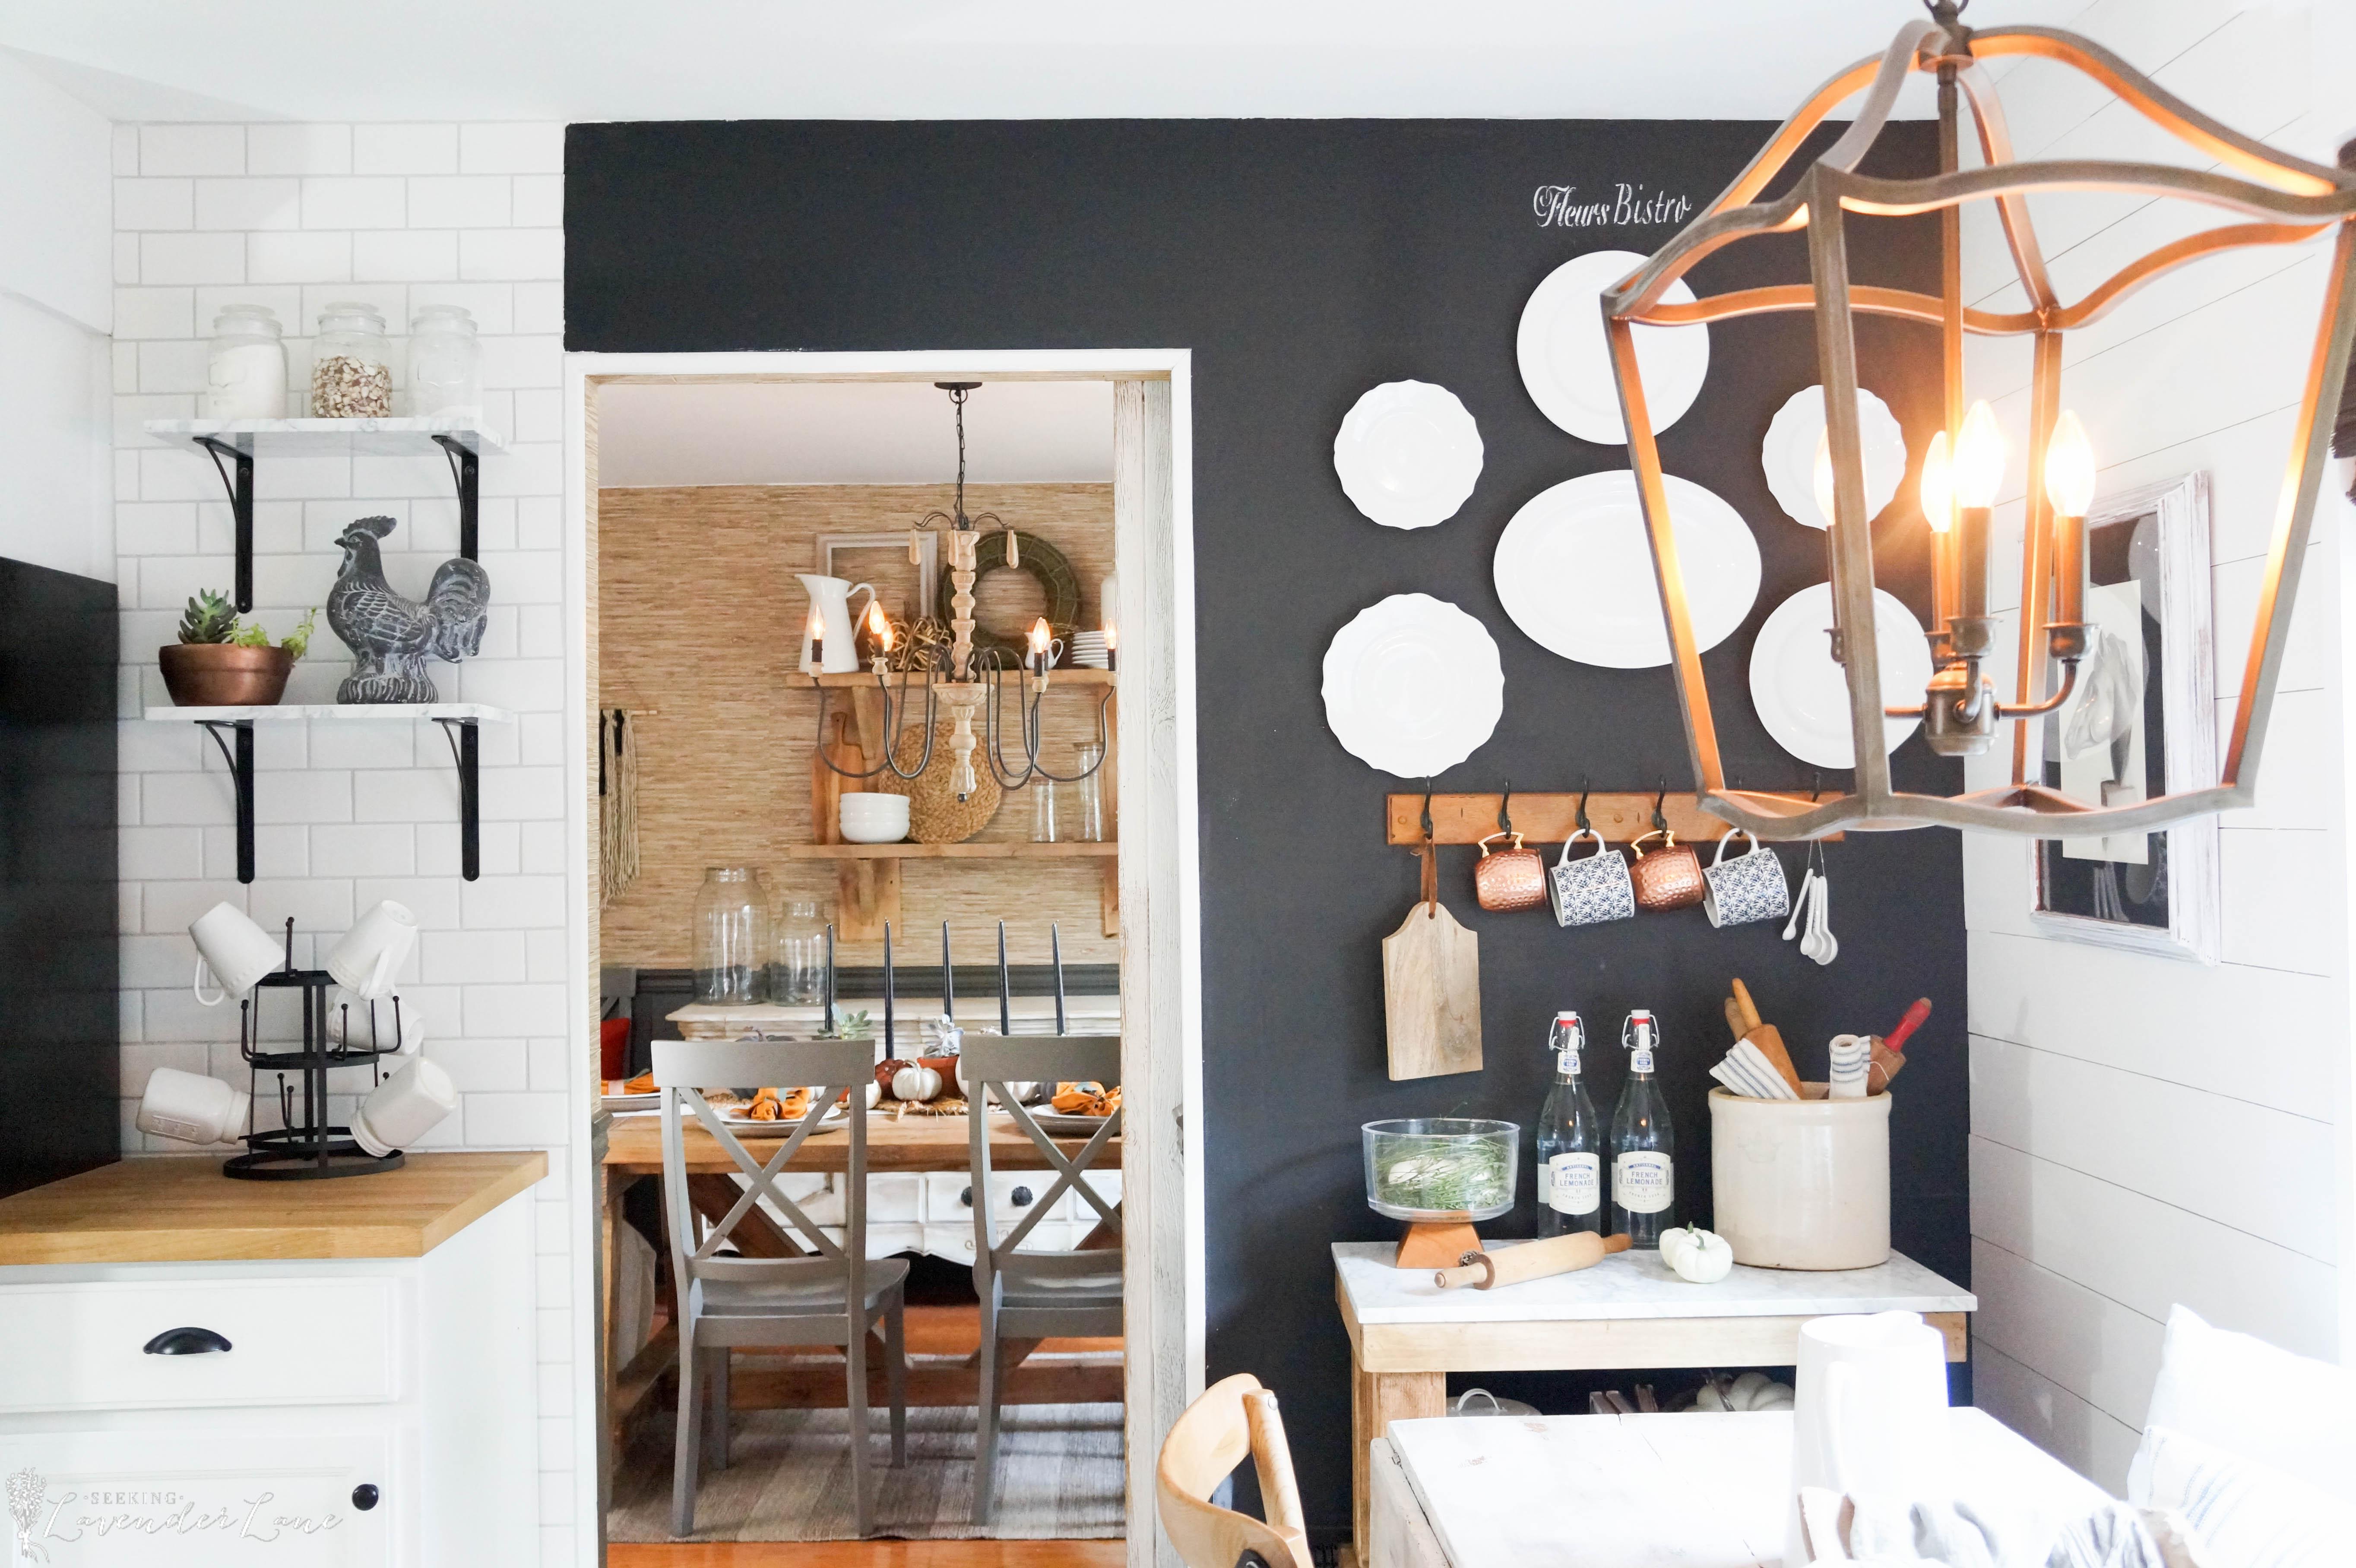 Farmhouse fall decor seeking lavendar lane - What is farmhouse style ...